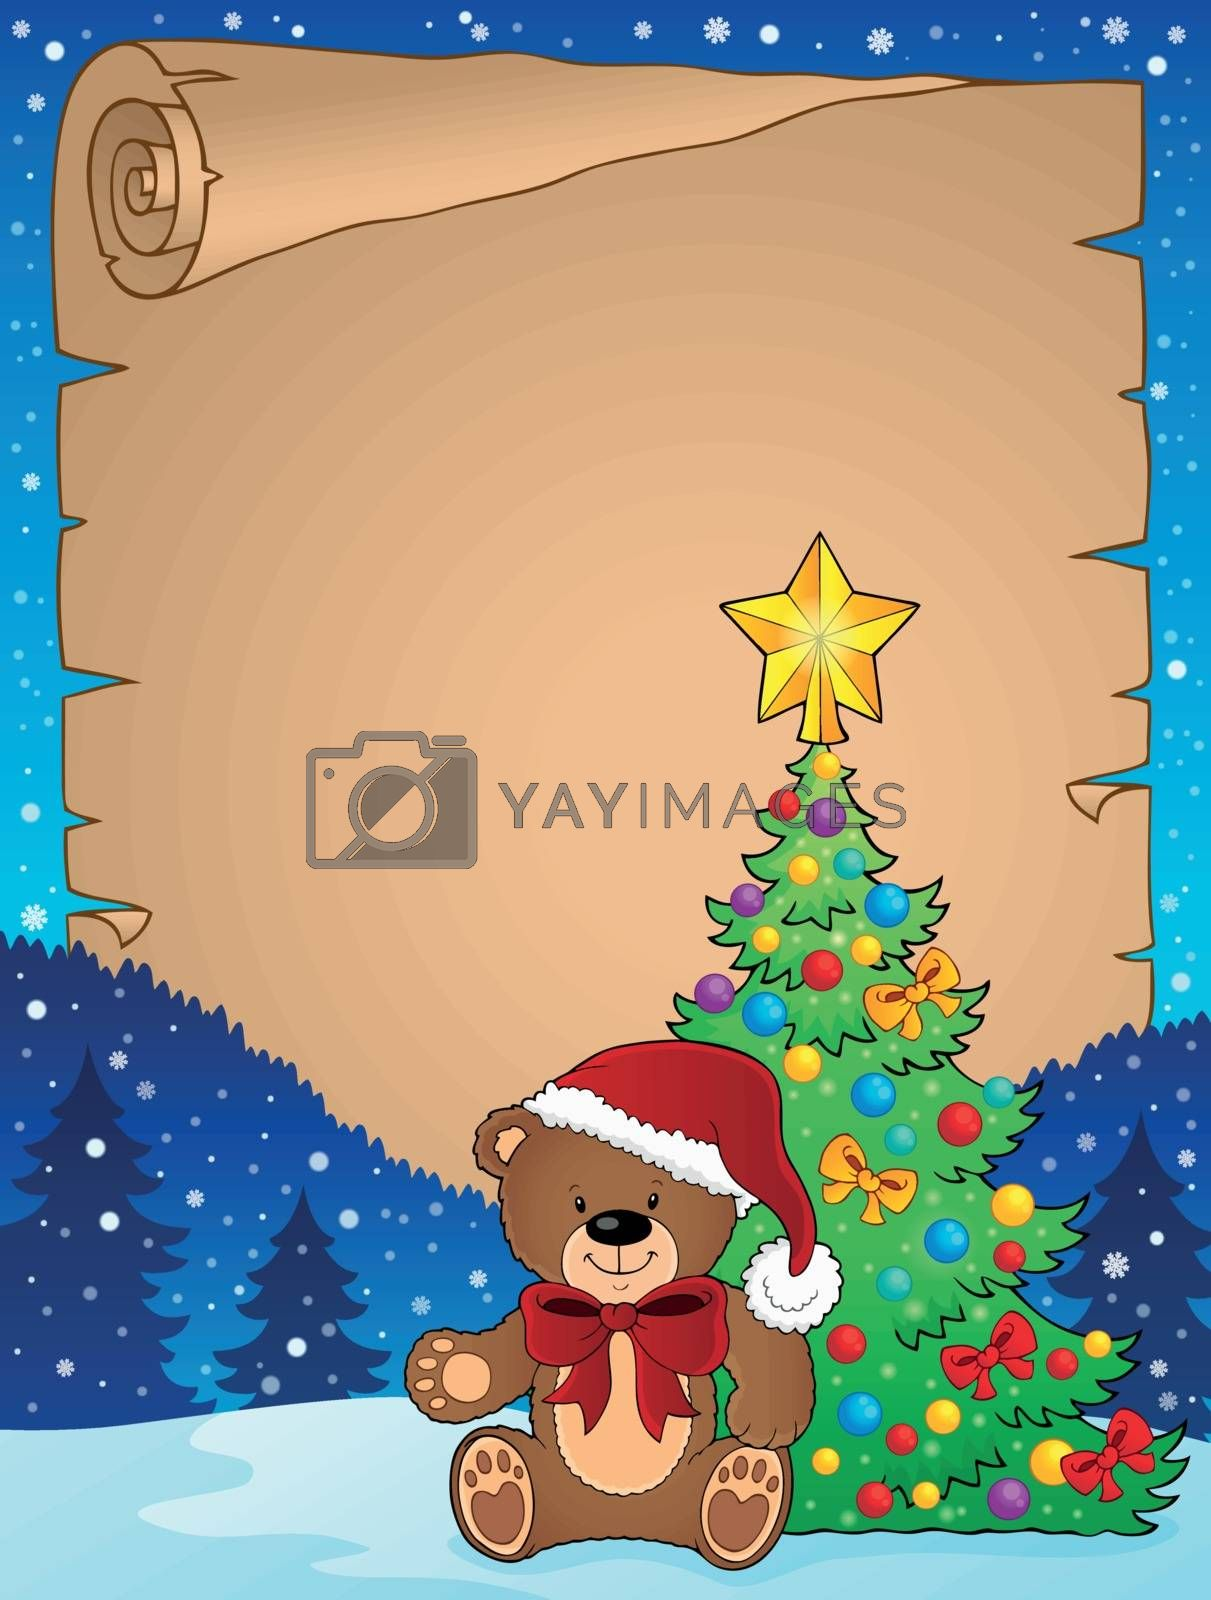 Christmas teddy bear topic parchment 2 - eps10 vector illustration.